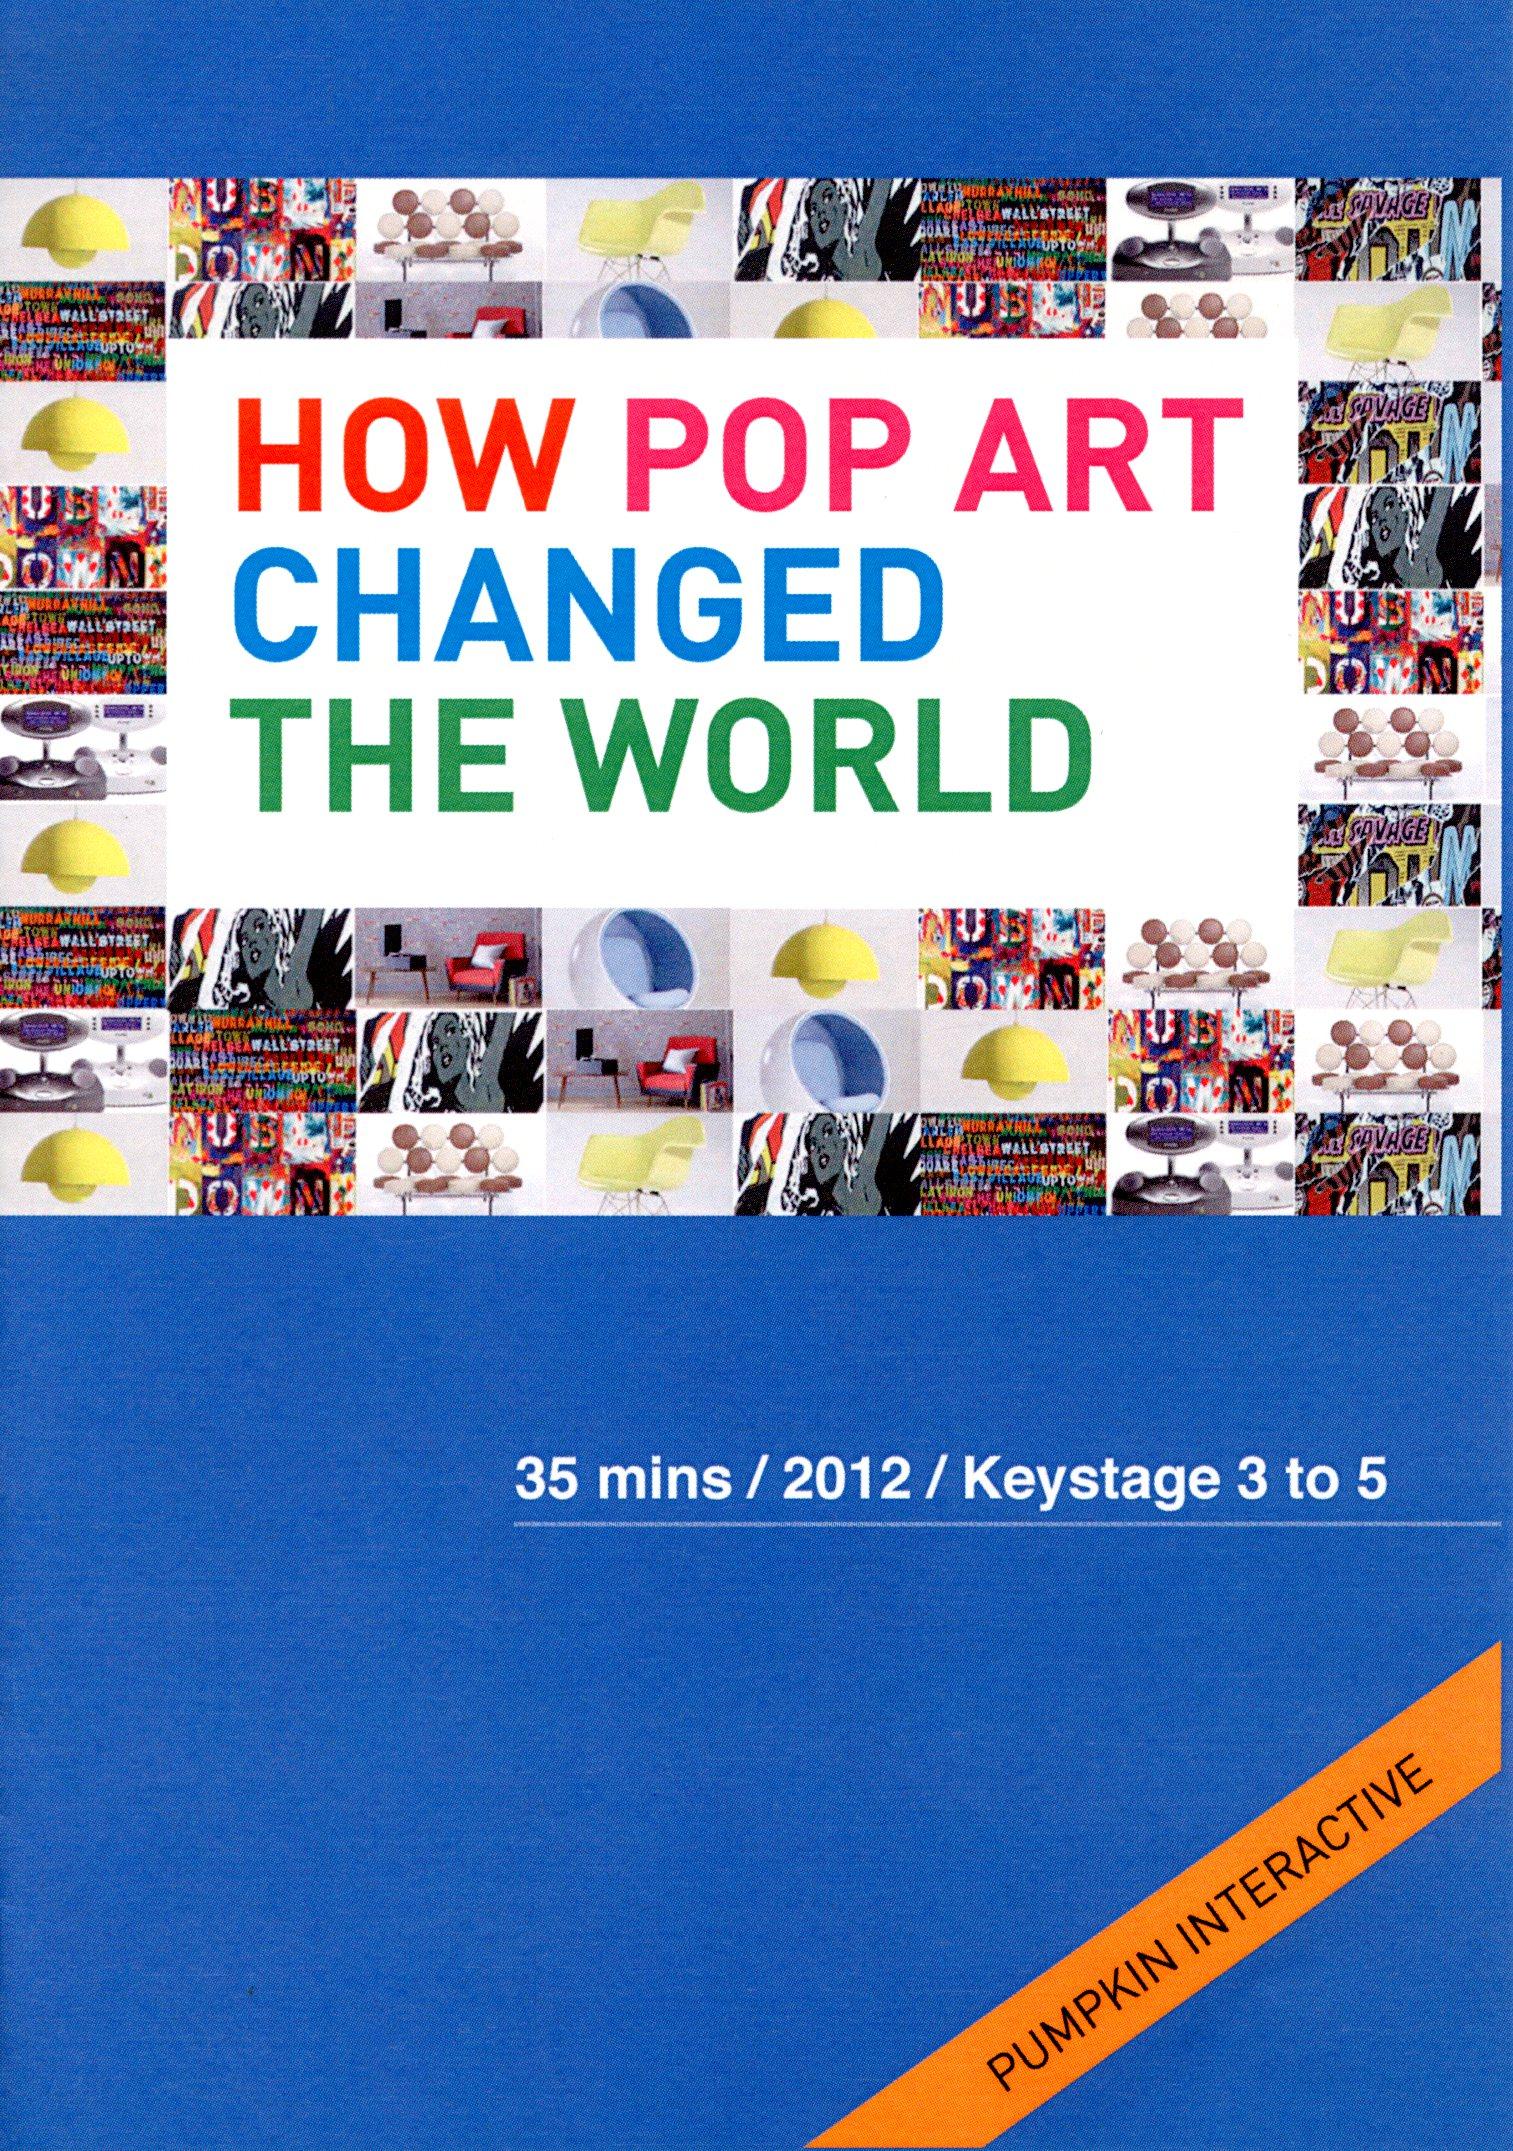 How pop art changed the world 普普藝術風席捲影響商品設計 /